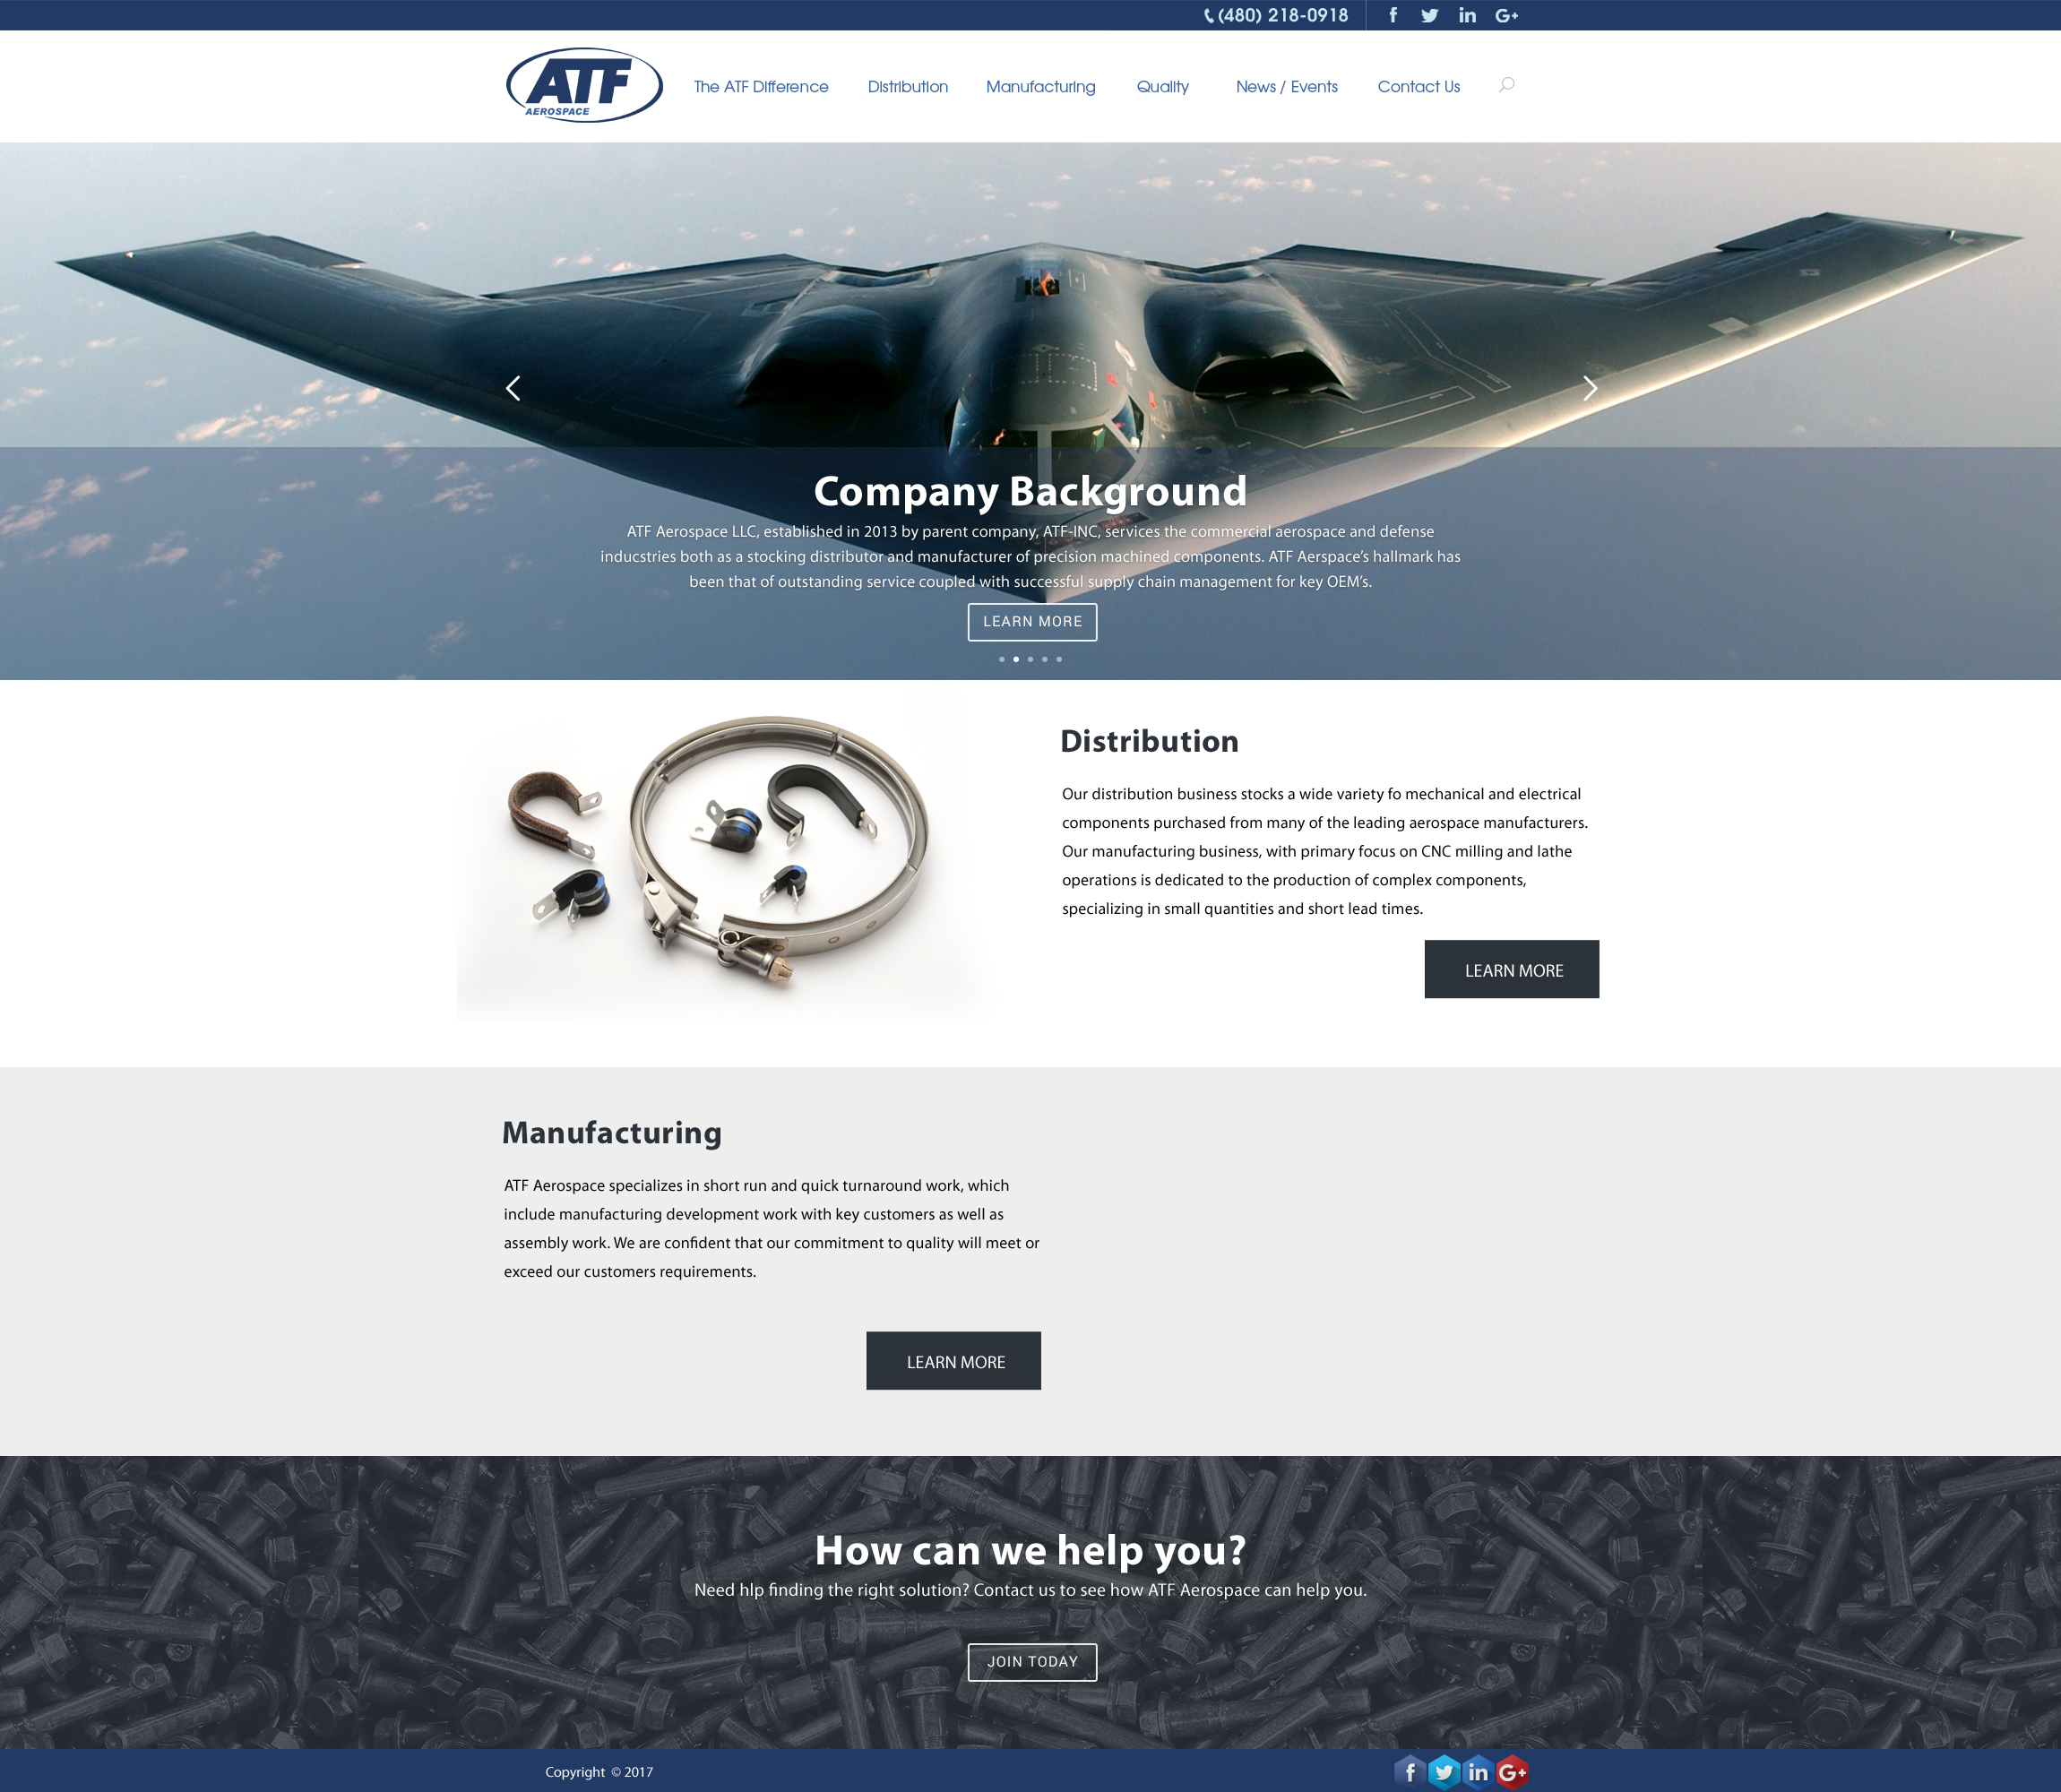 ATF_home